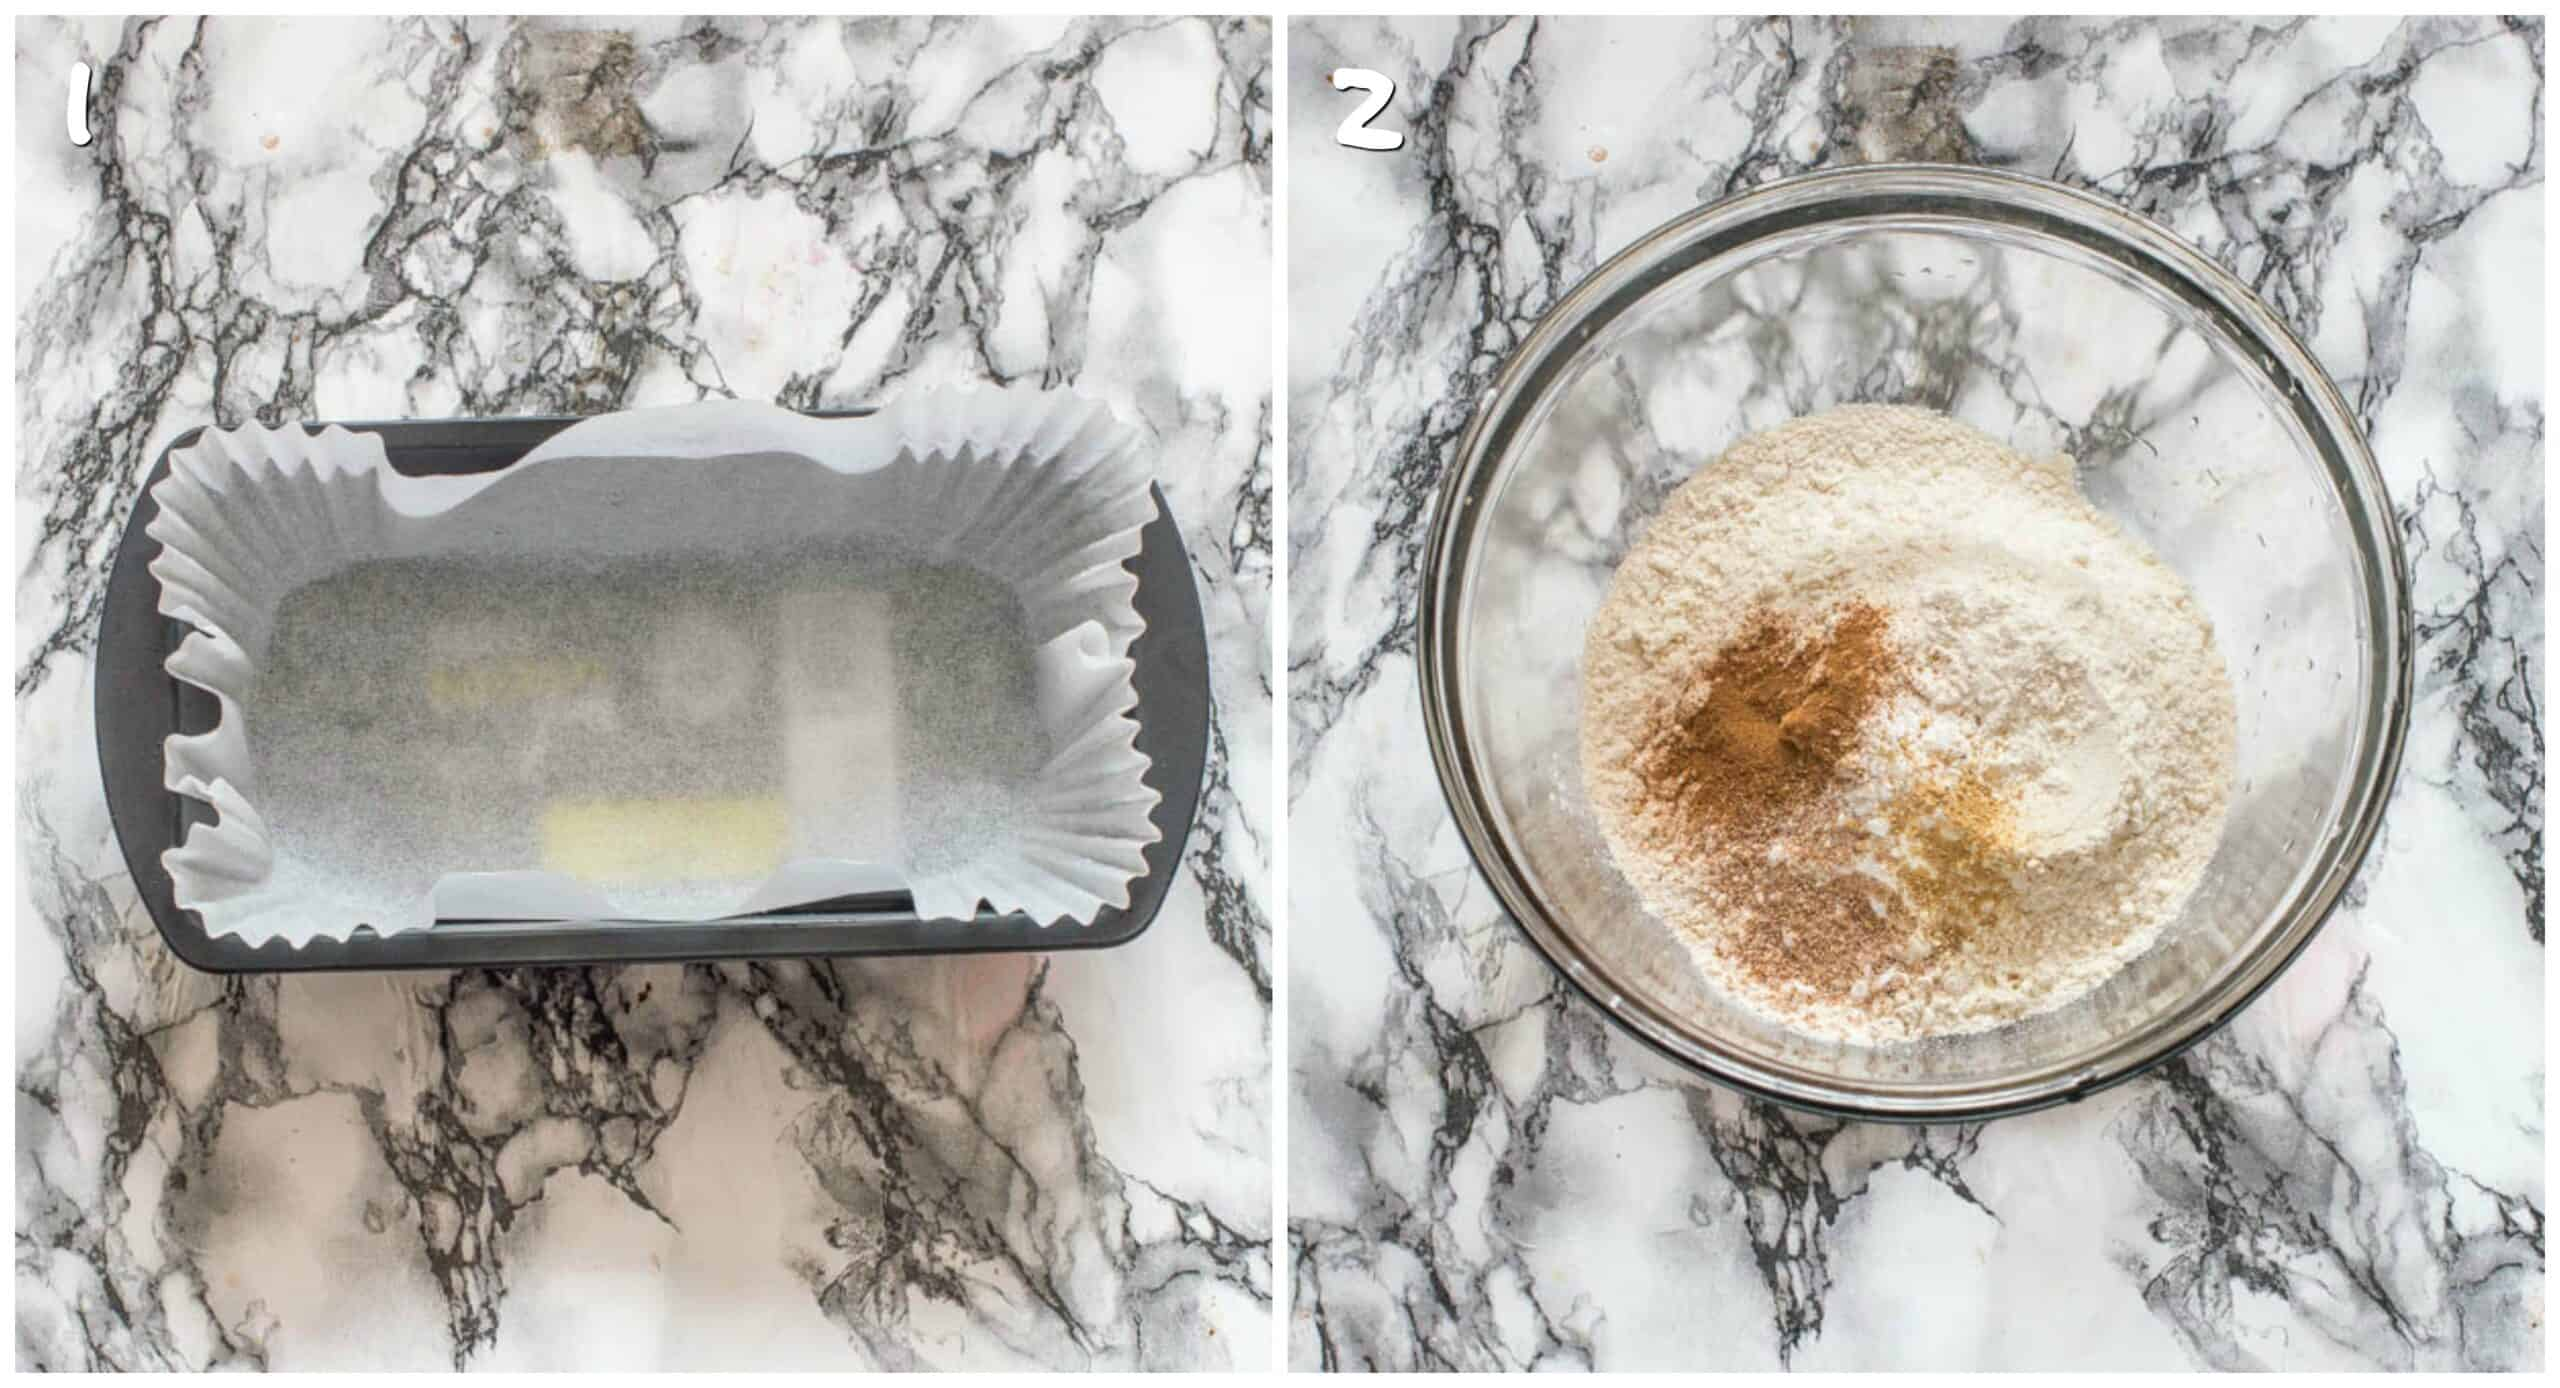 Steps 1-2 loaf pan with dry ingredients